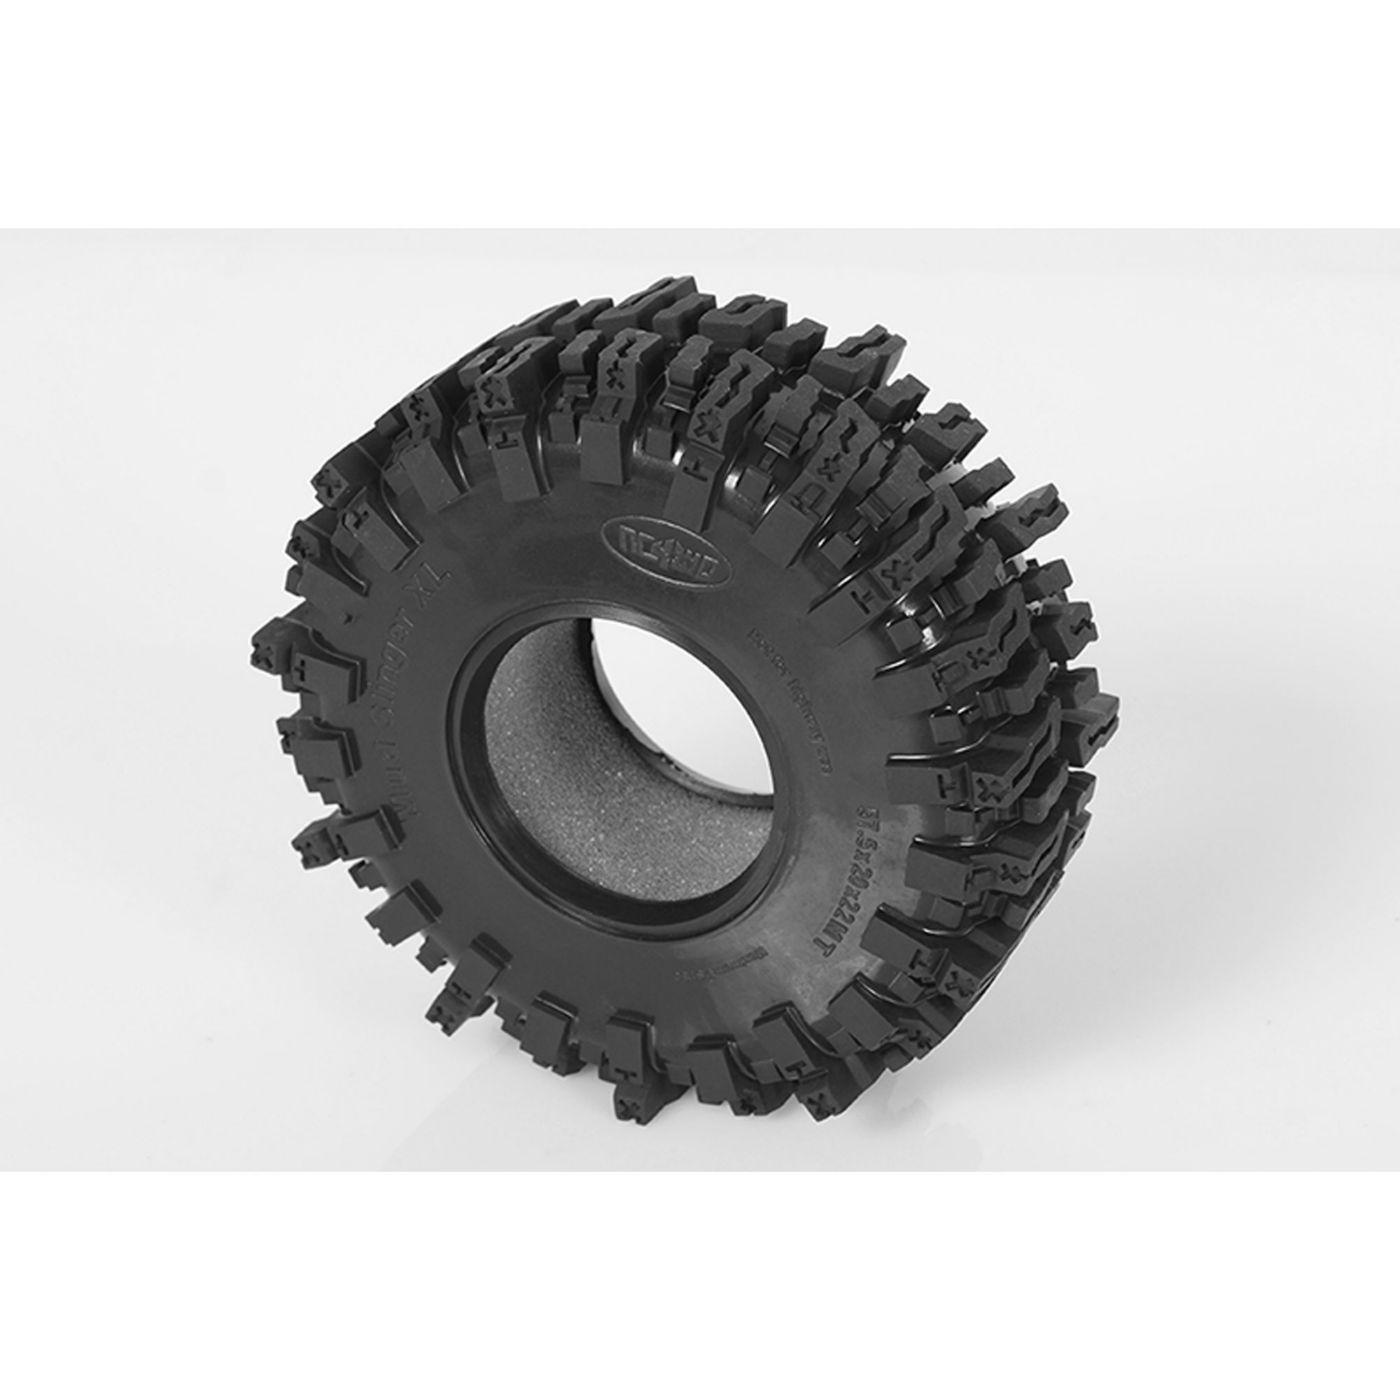 Mud Slinger 2 XL 2.2 Scale Tires (2)  (RC4ZT0122)